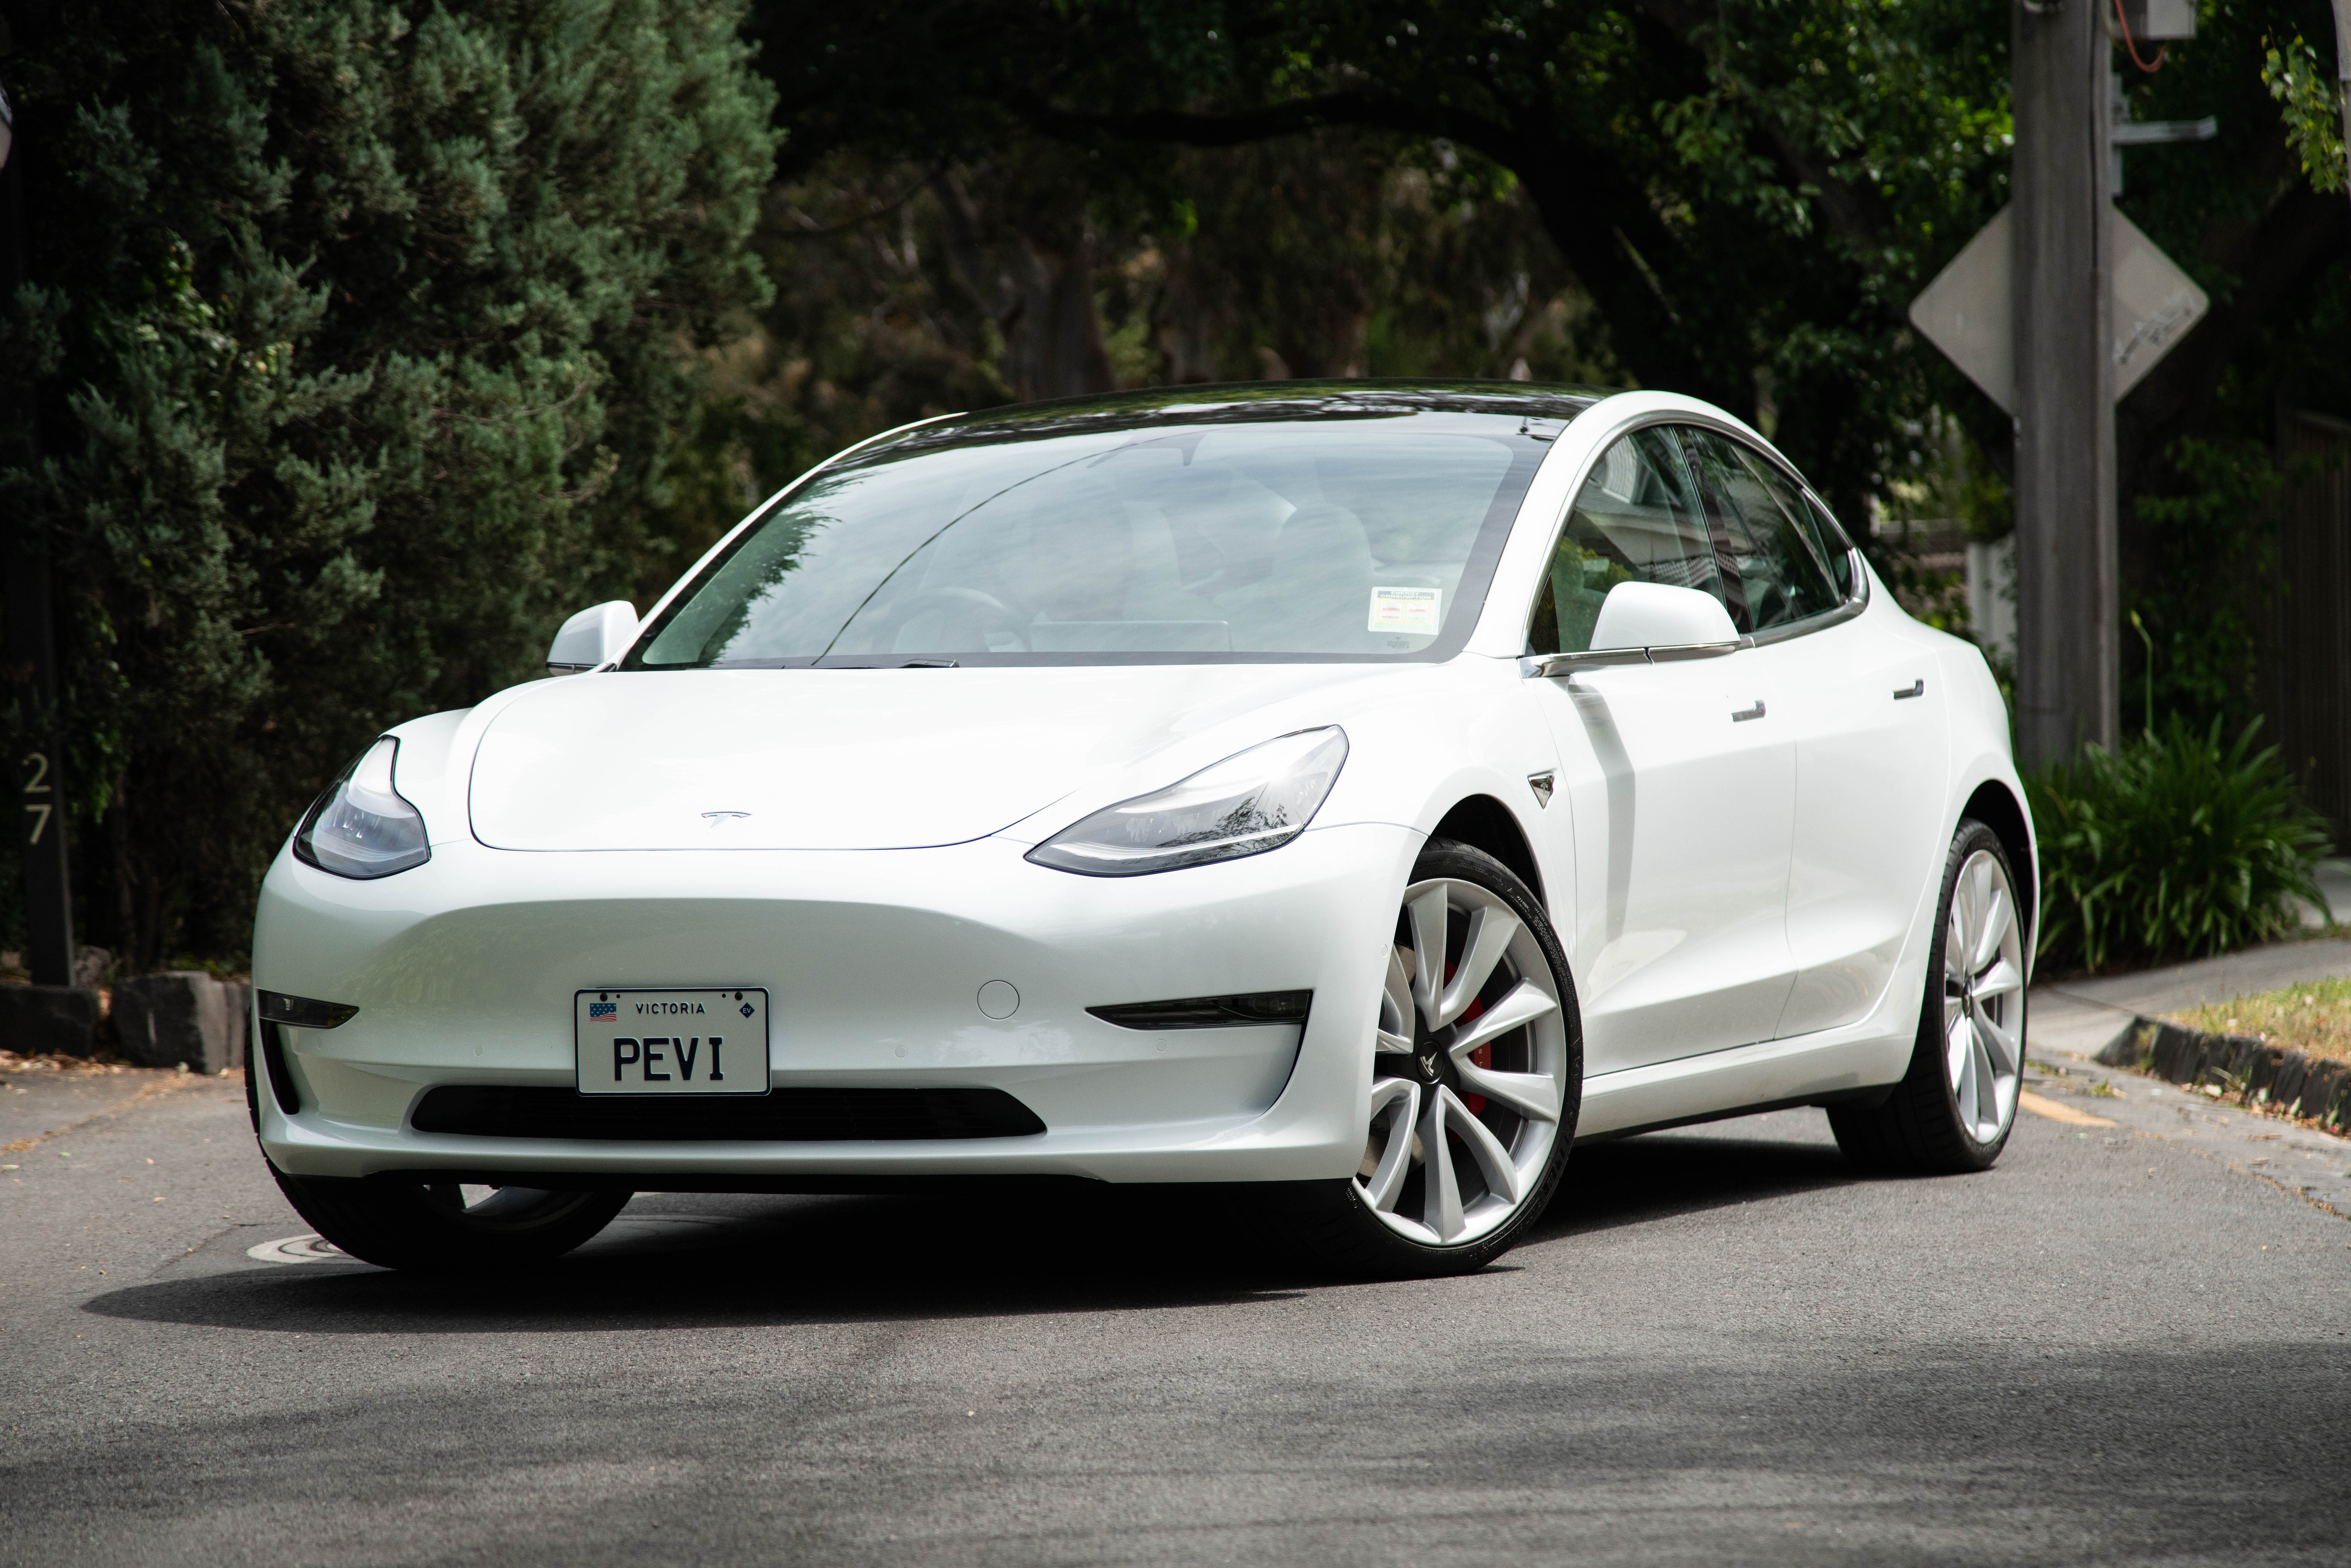 2020 Tesla Model 3 Performance long-term review: Introduction